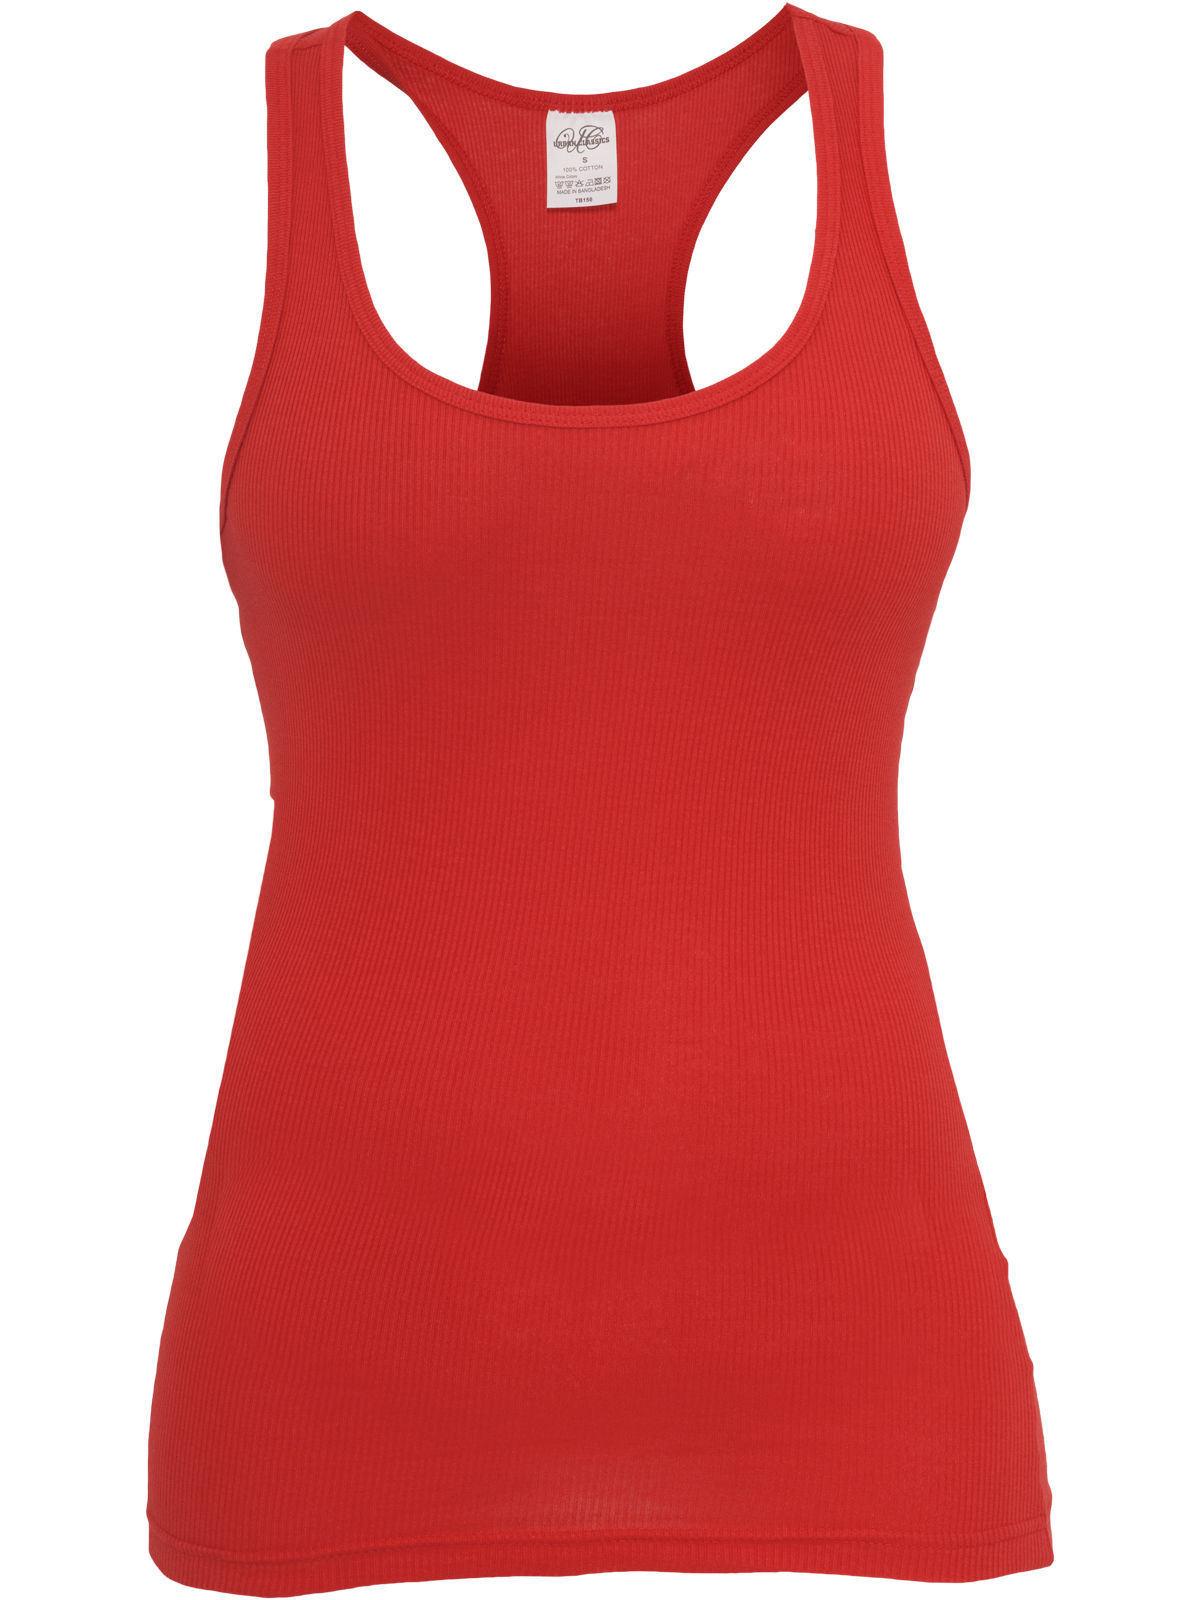 OEM Service Sexy Women Tank Top/Vest/Singlet